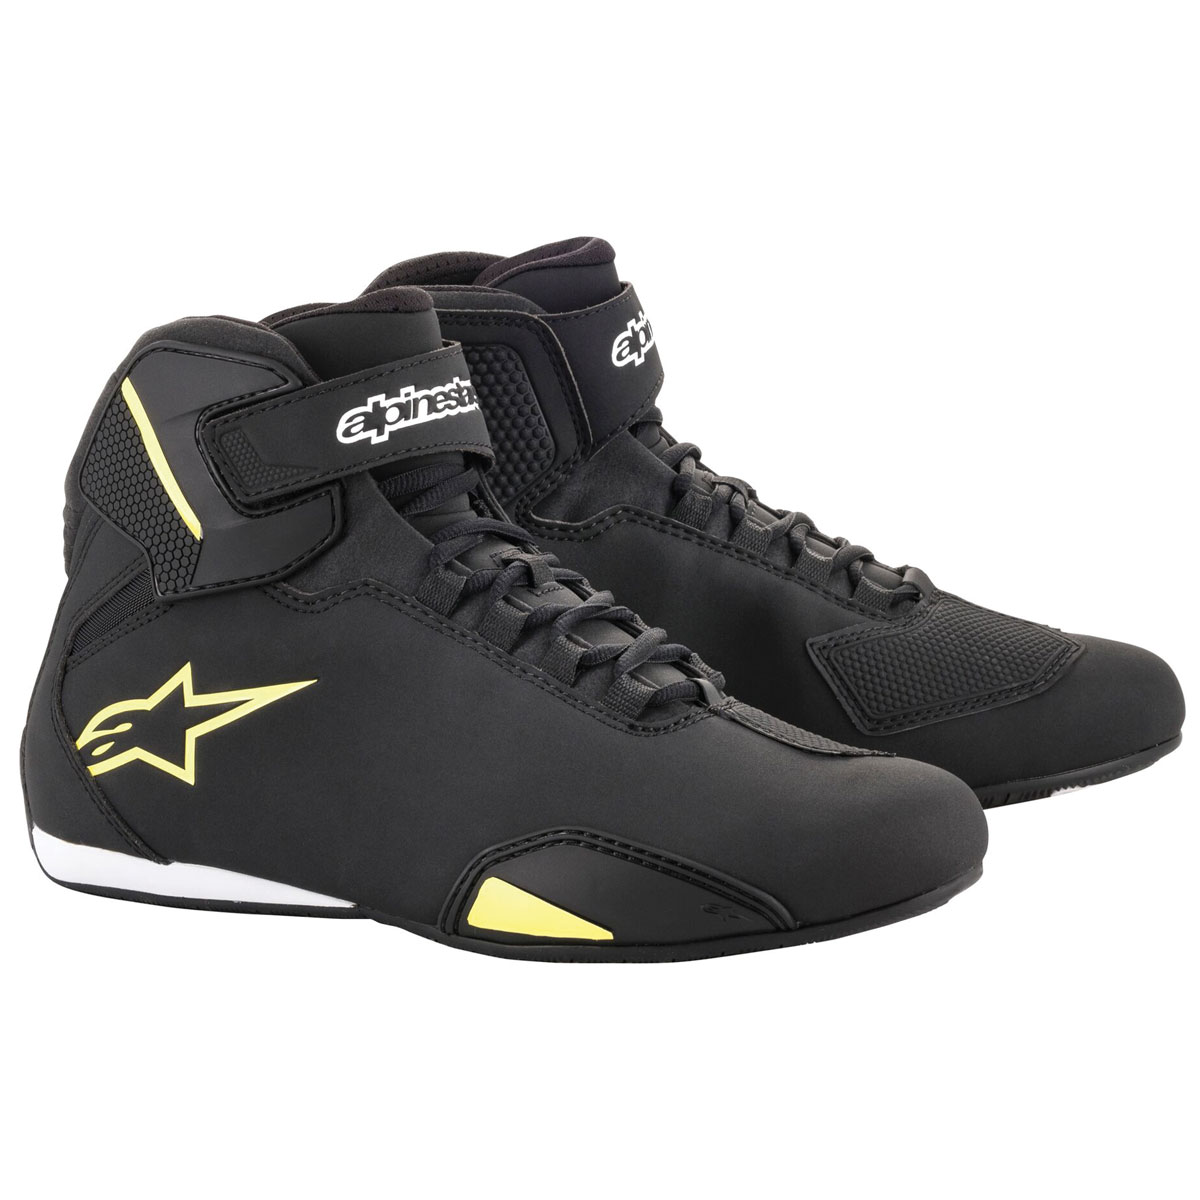 Alpinestars Men's Sektor Black/Yellow Riding Shoes